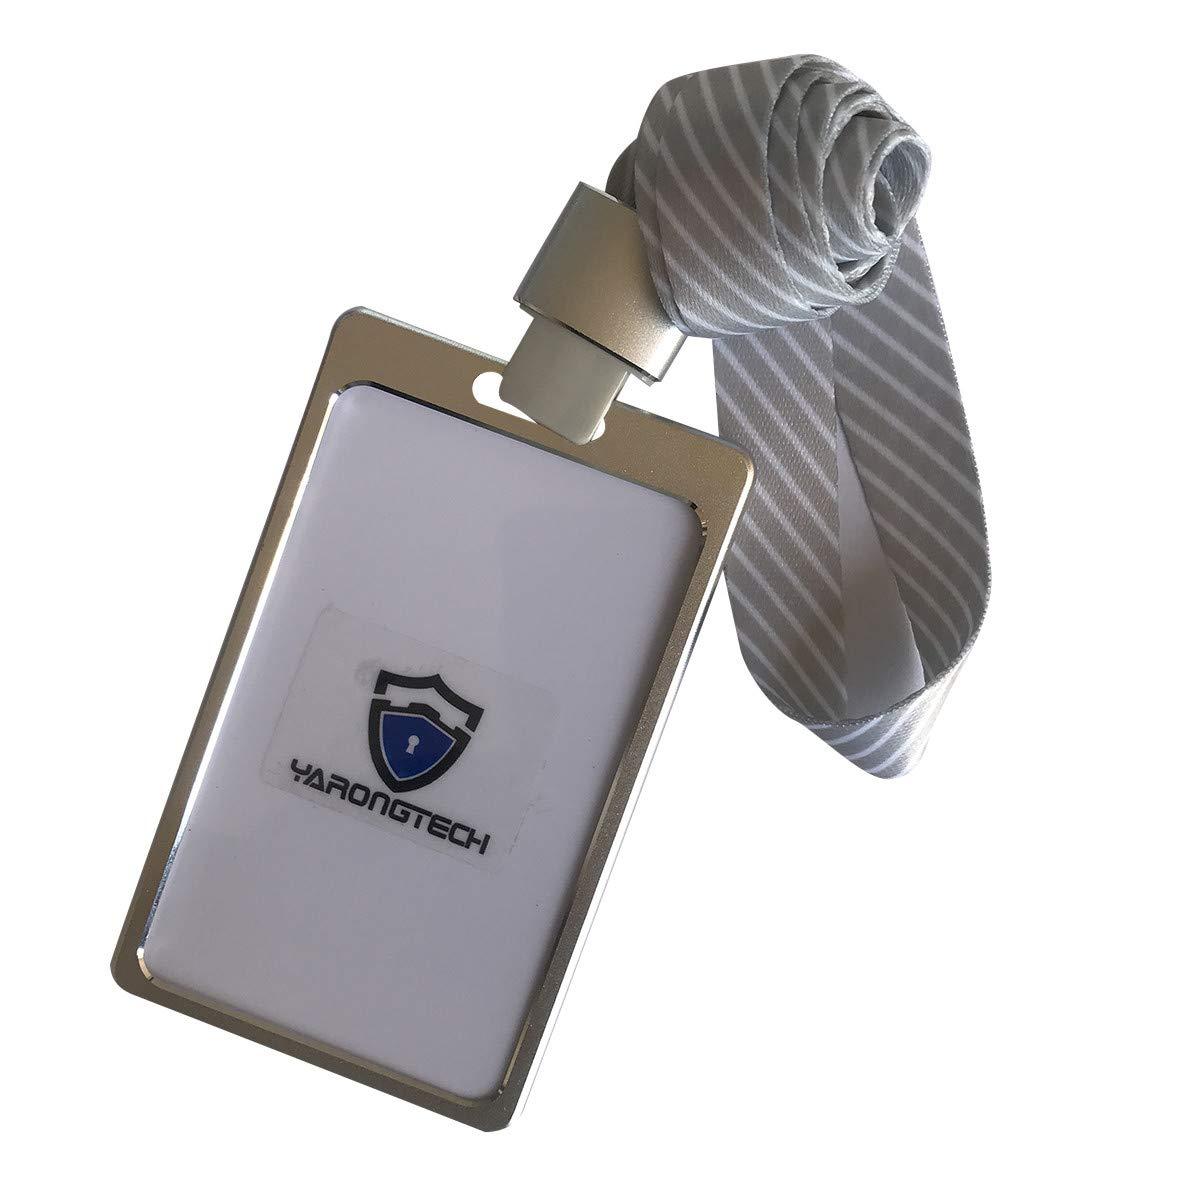 Ausweishalter aus Aluminiumlegierung, für Arbeitsausweis, mit abnehmbarem Band Silver-1pc